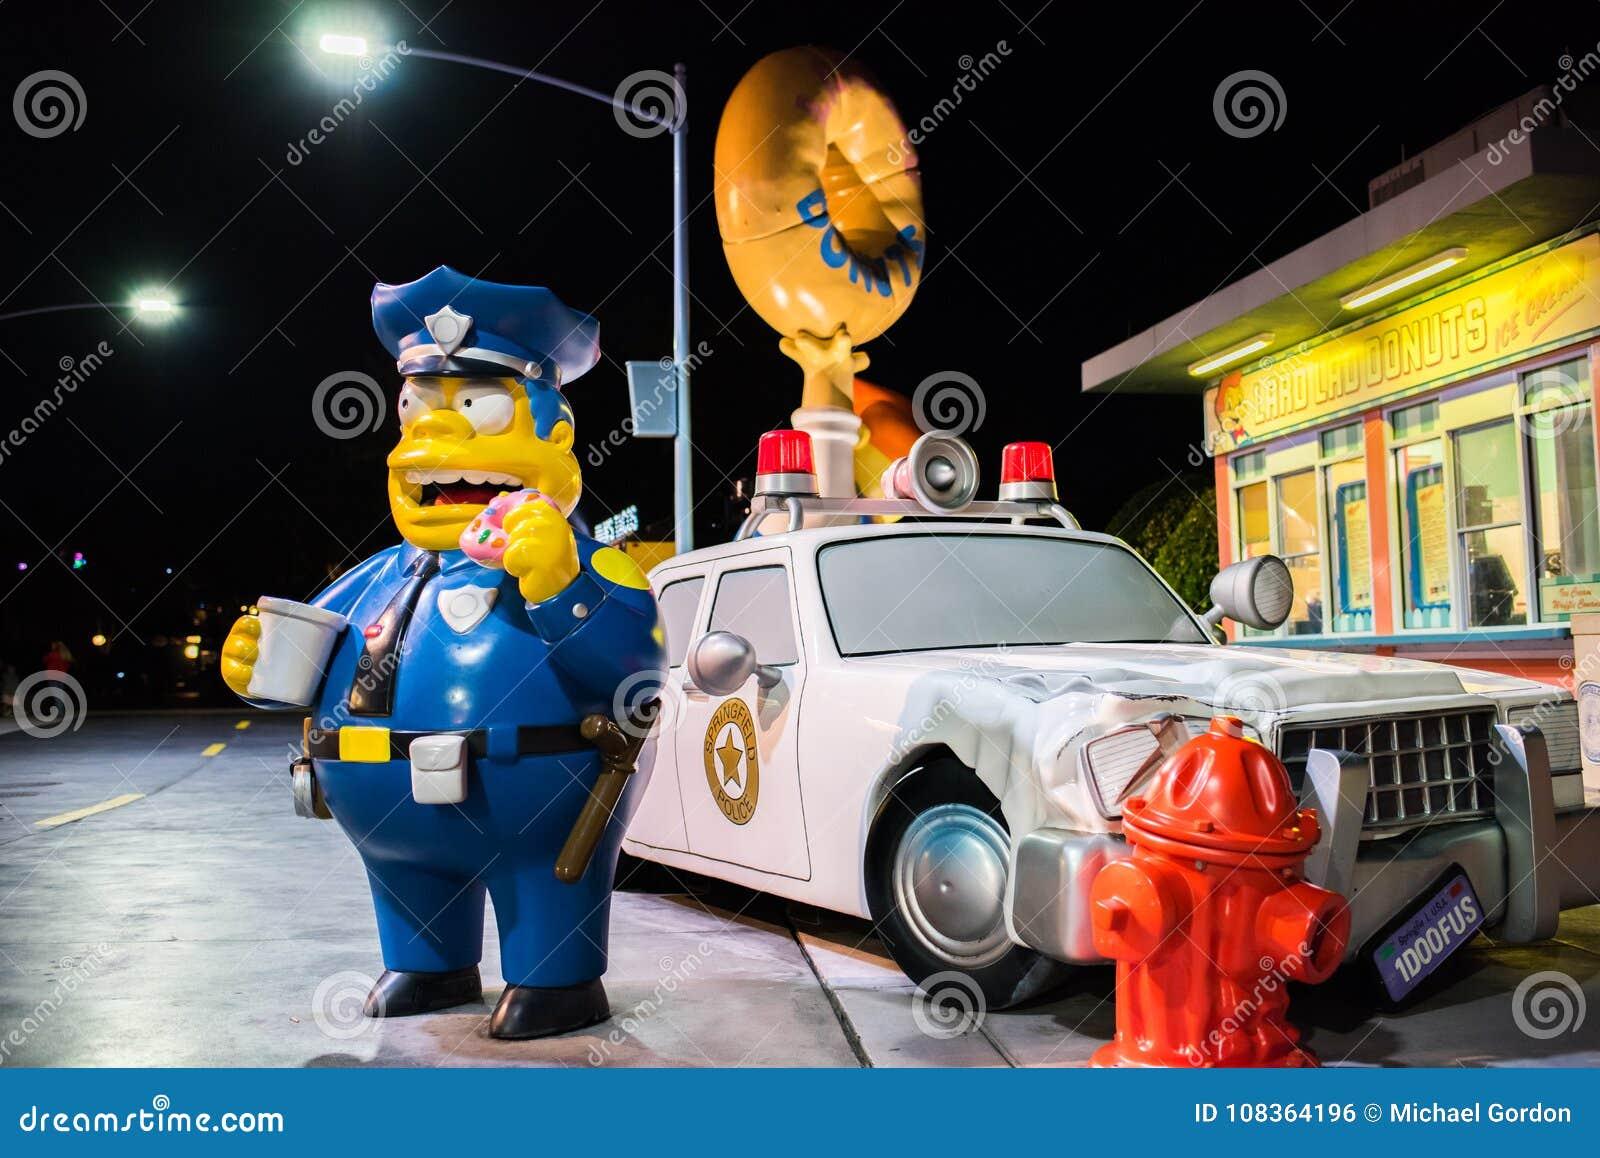 The Simpsons area at Universal Studios Florida.